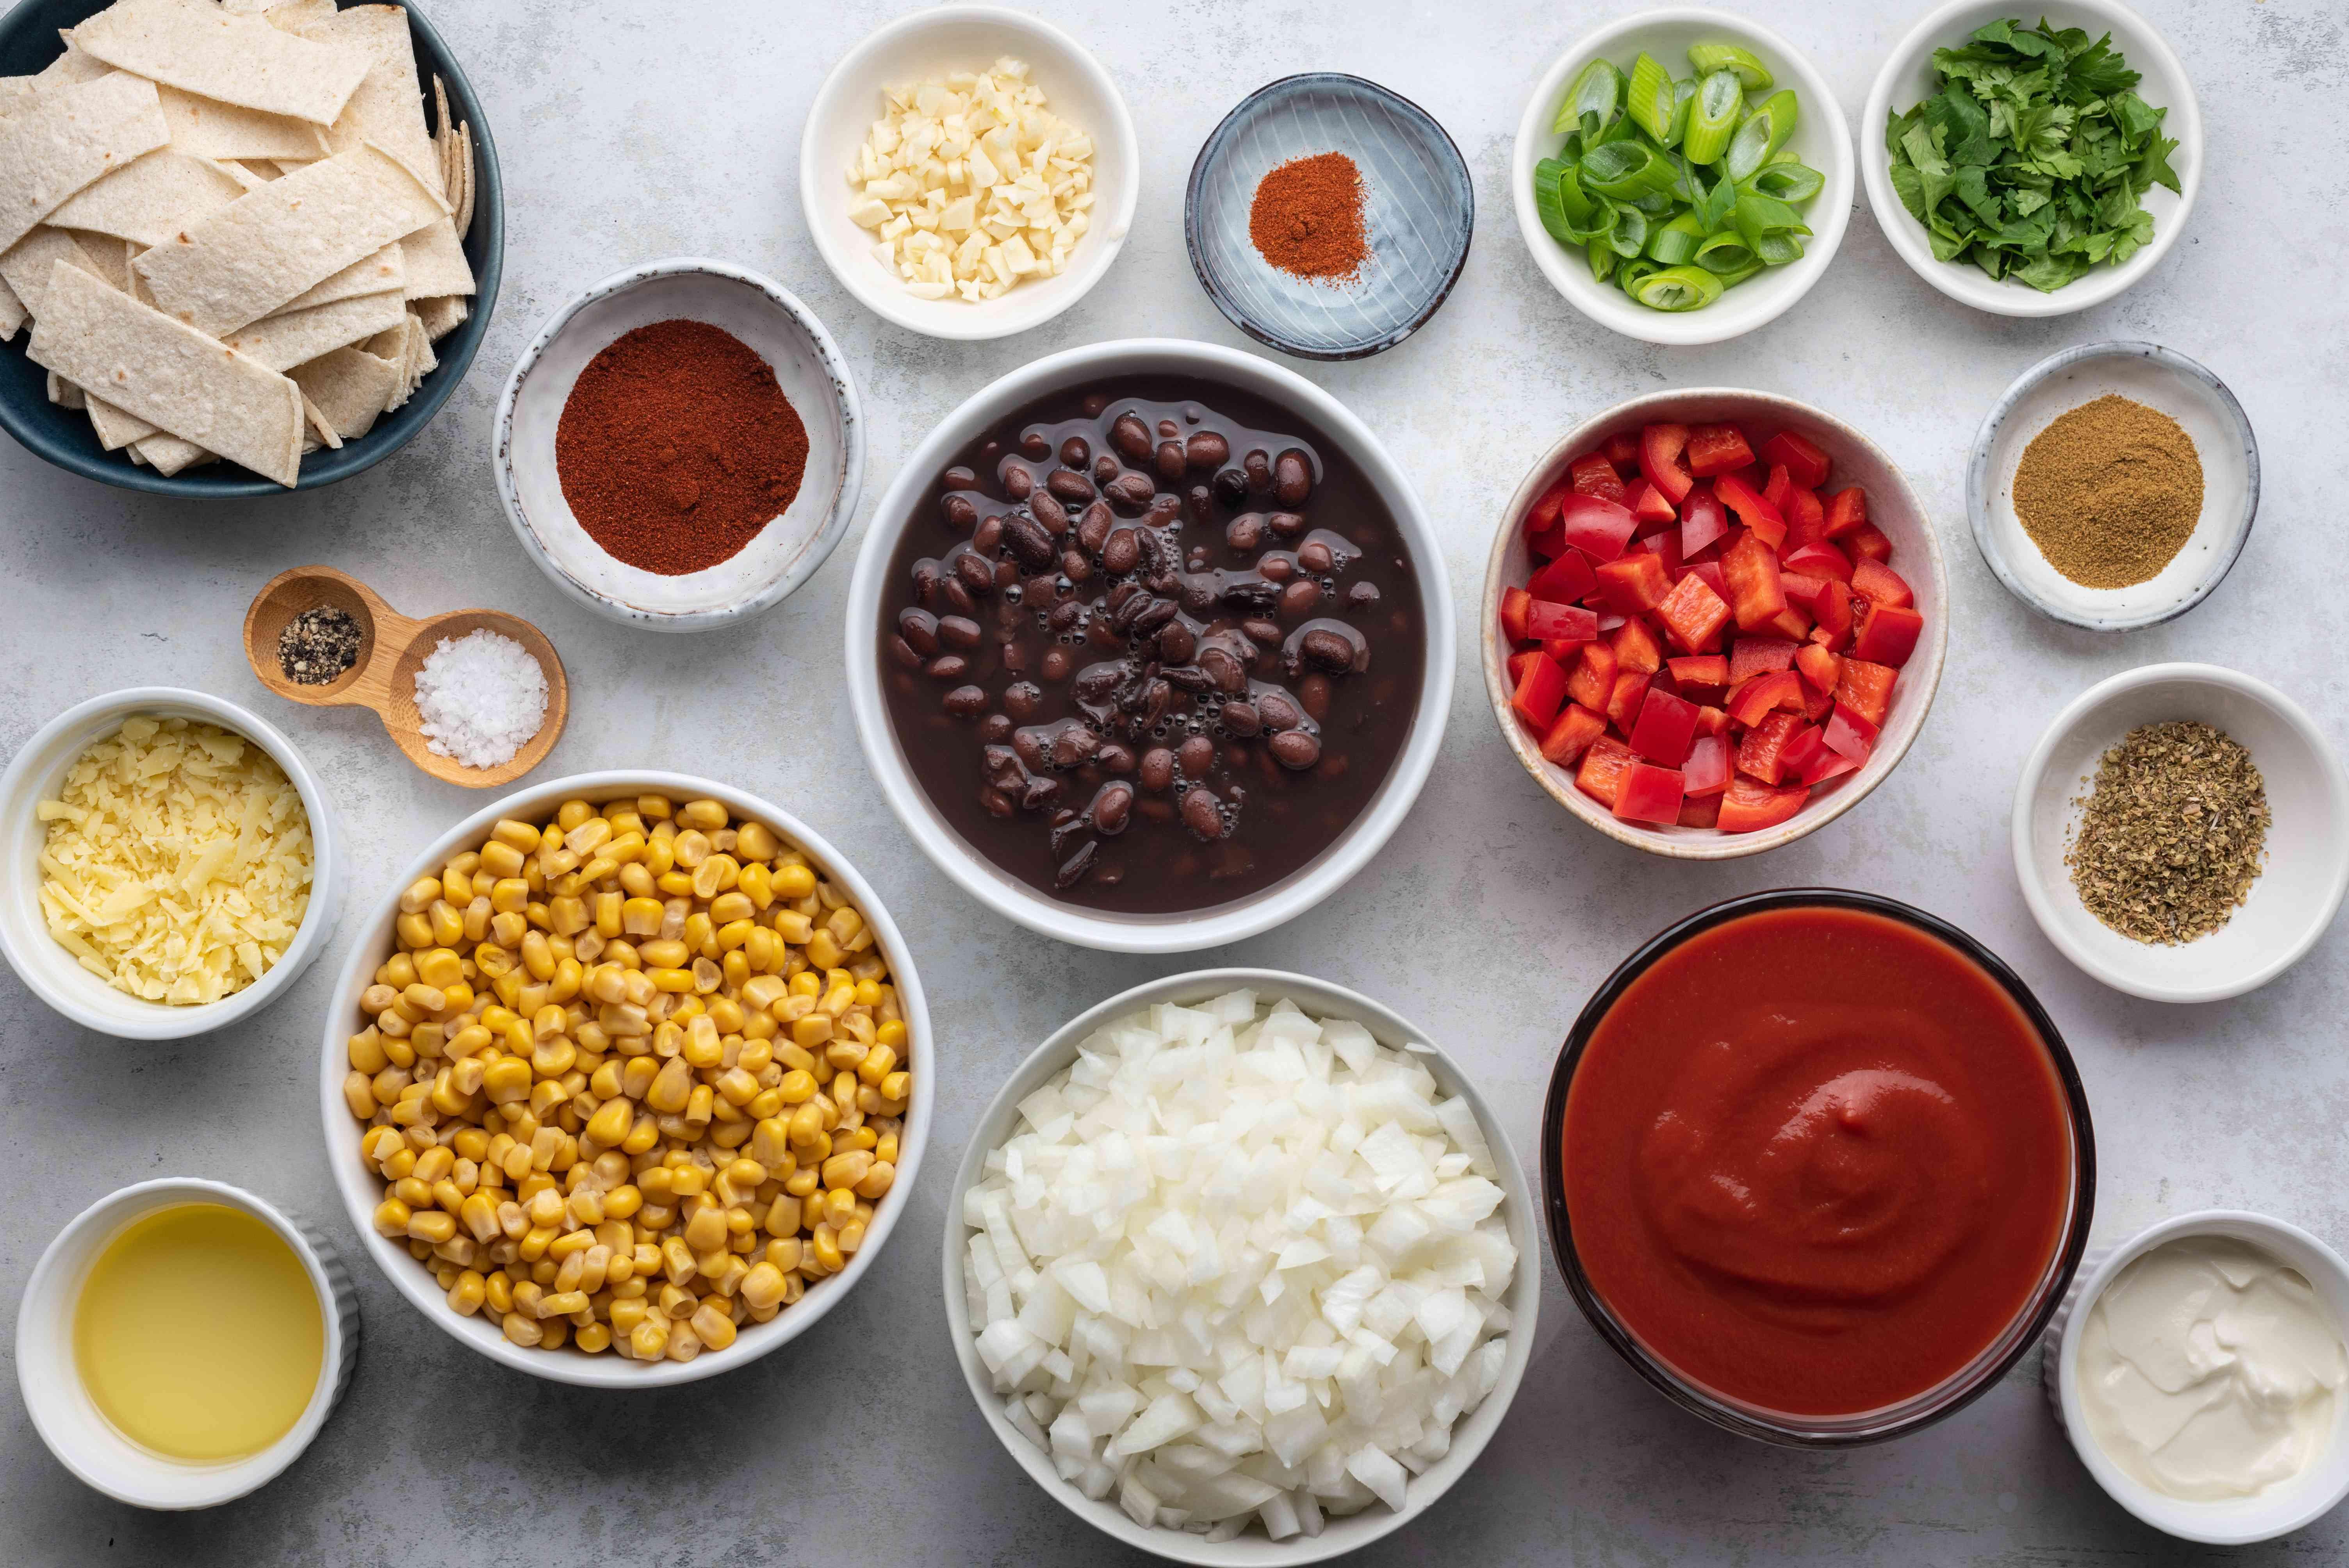 Ingredients to make black bean and corn chili